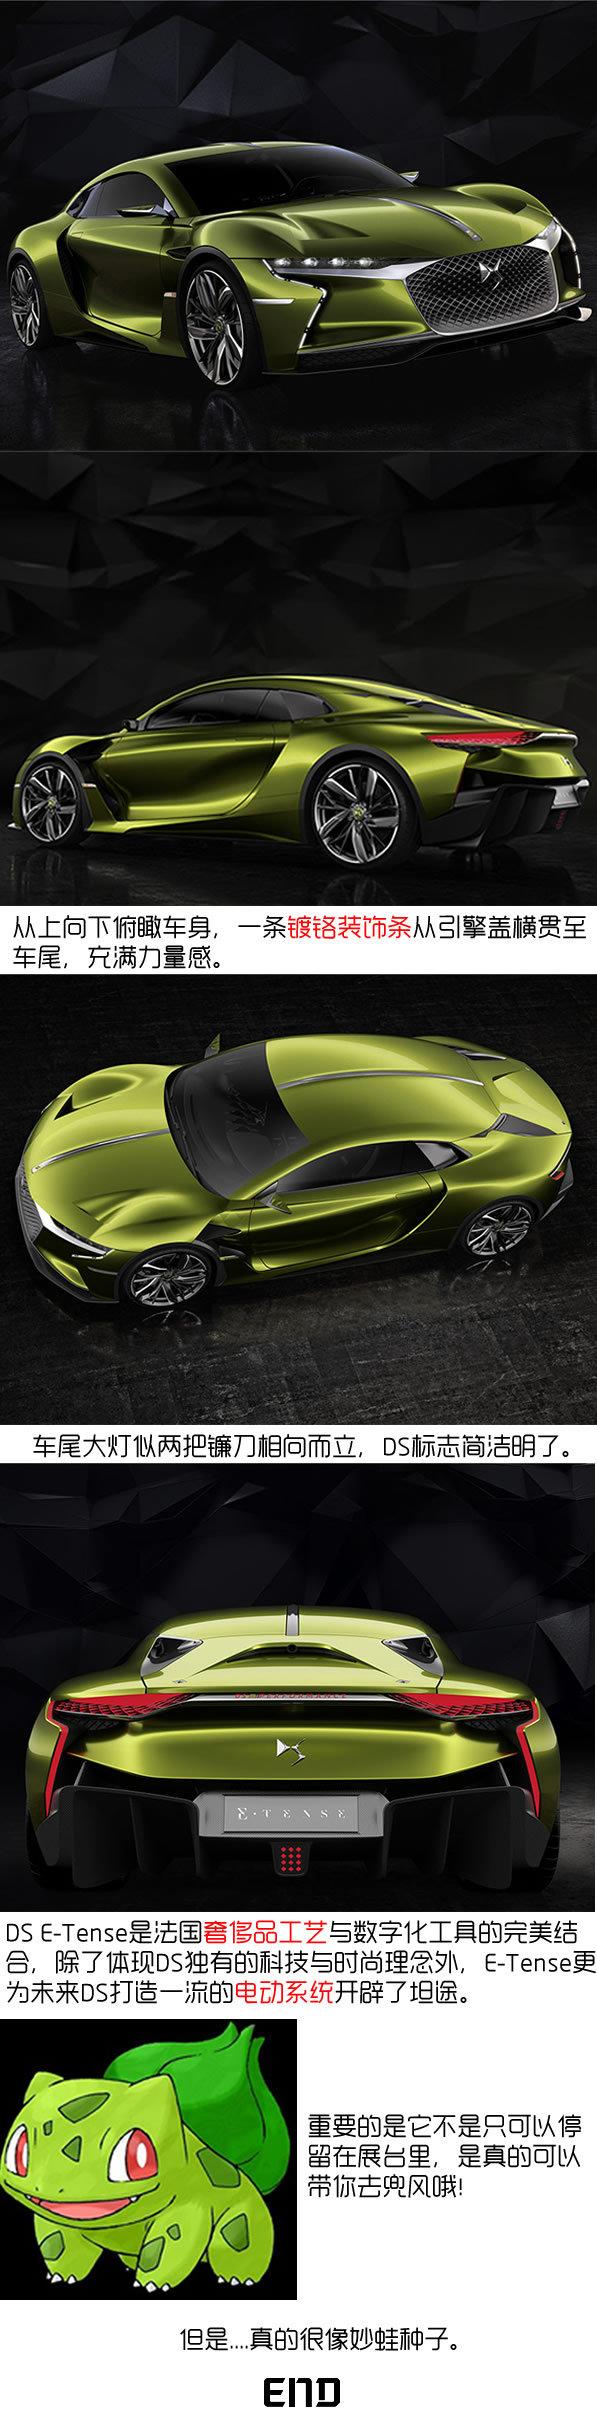 DS公布E-Tense效果图 日内瓦车展首发-图2